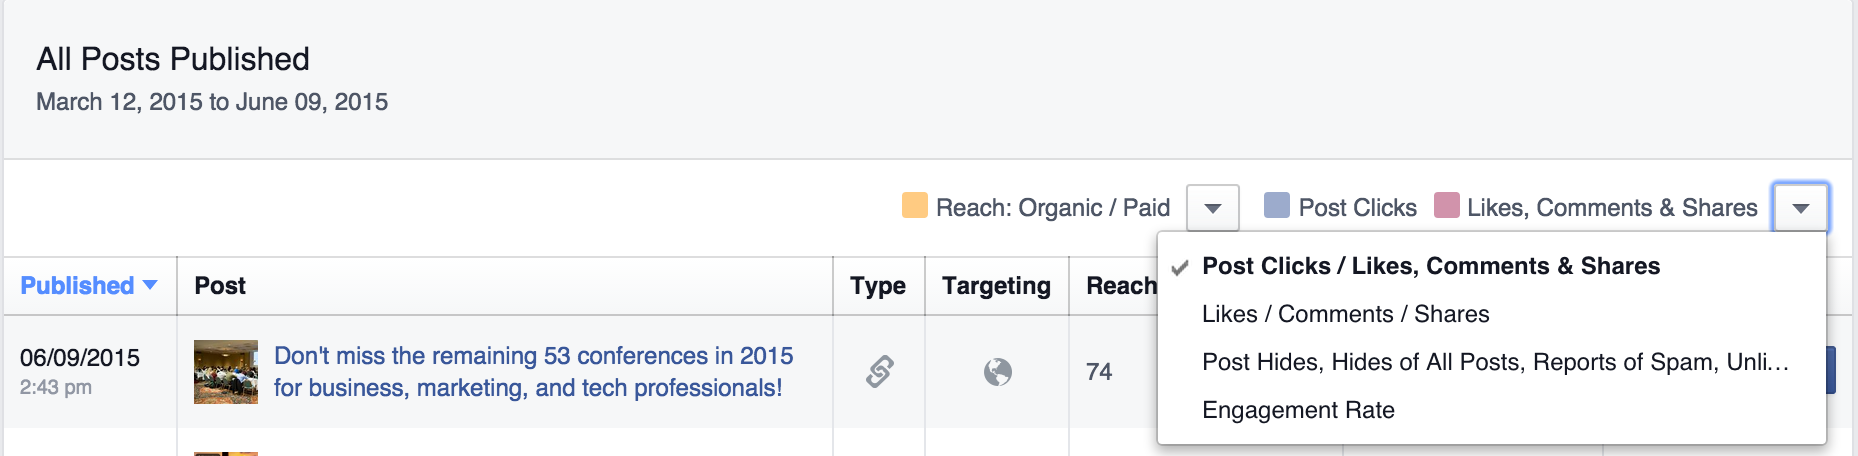 facebook metrics post clicks screenshot